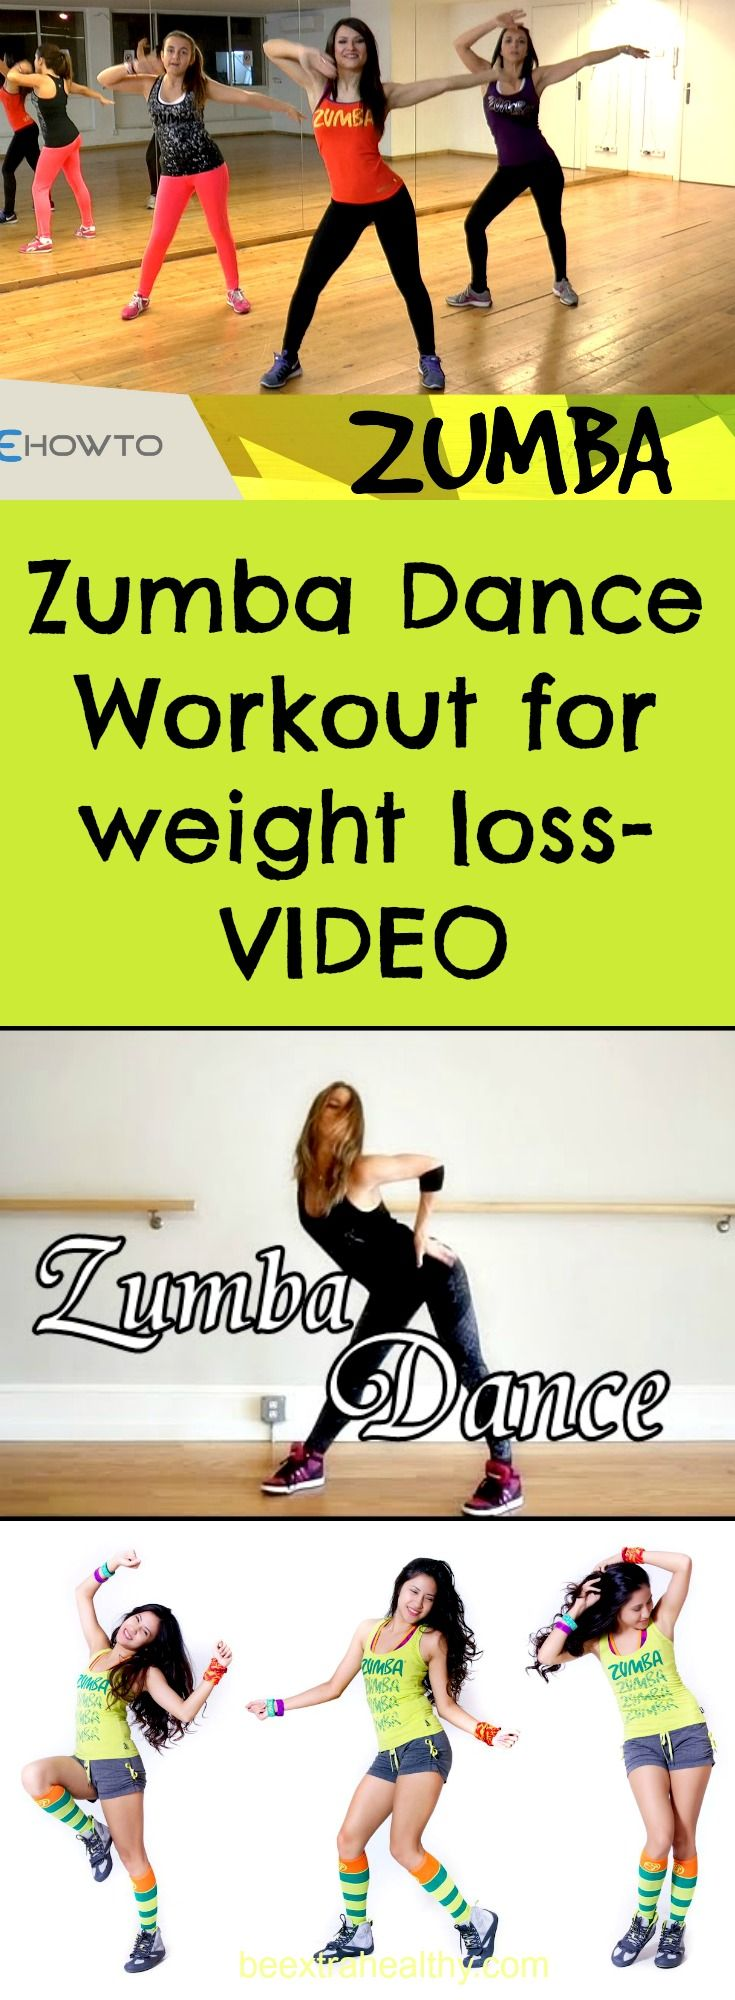 @ video zumba dance workout Discount. - 2dietshop.com